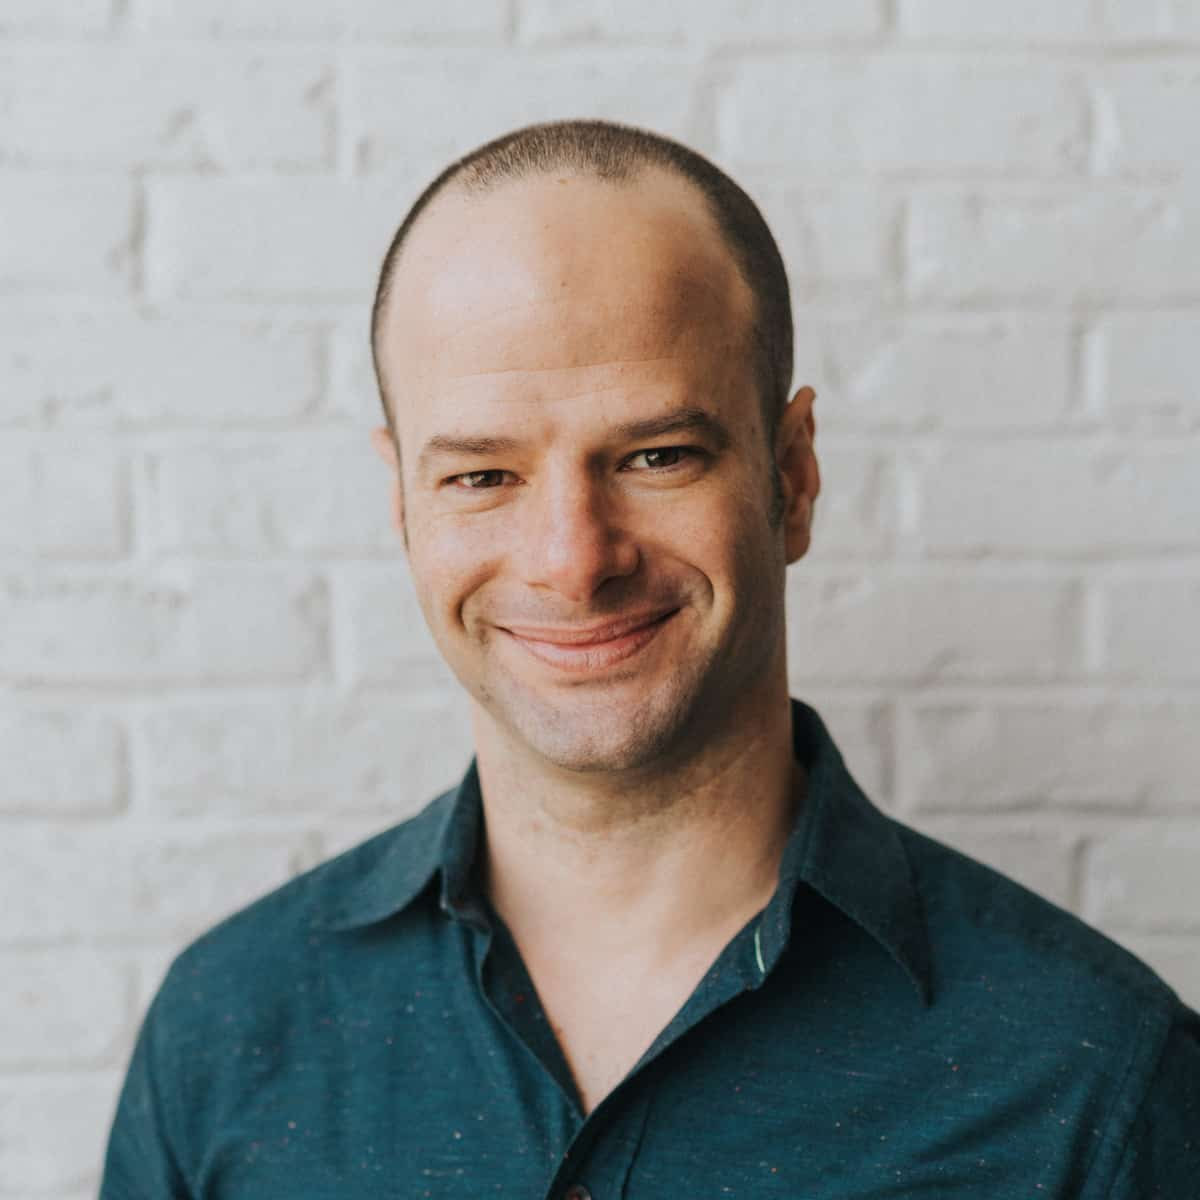 Michael Gurevich, Data Analyst